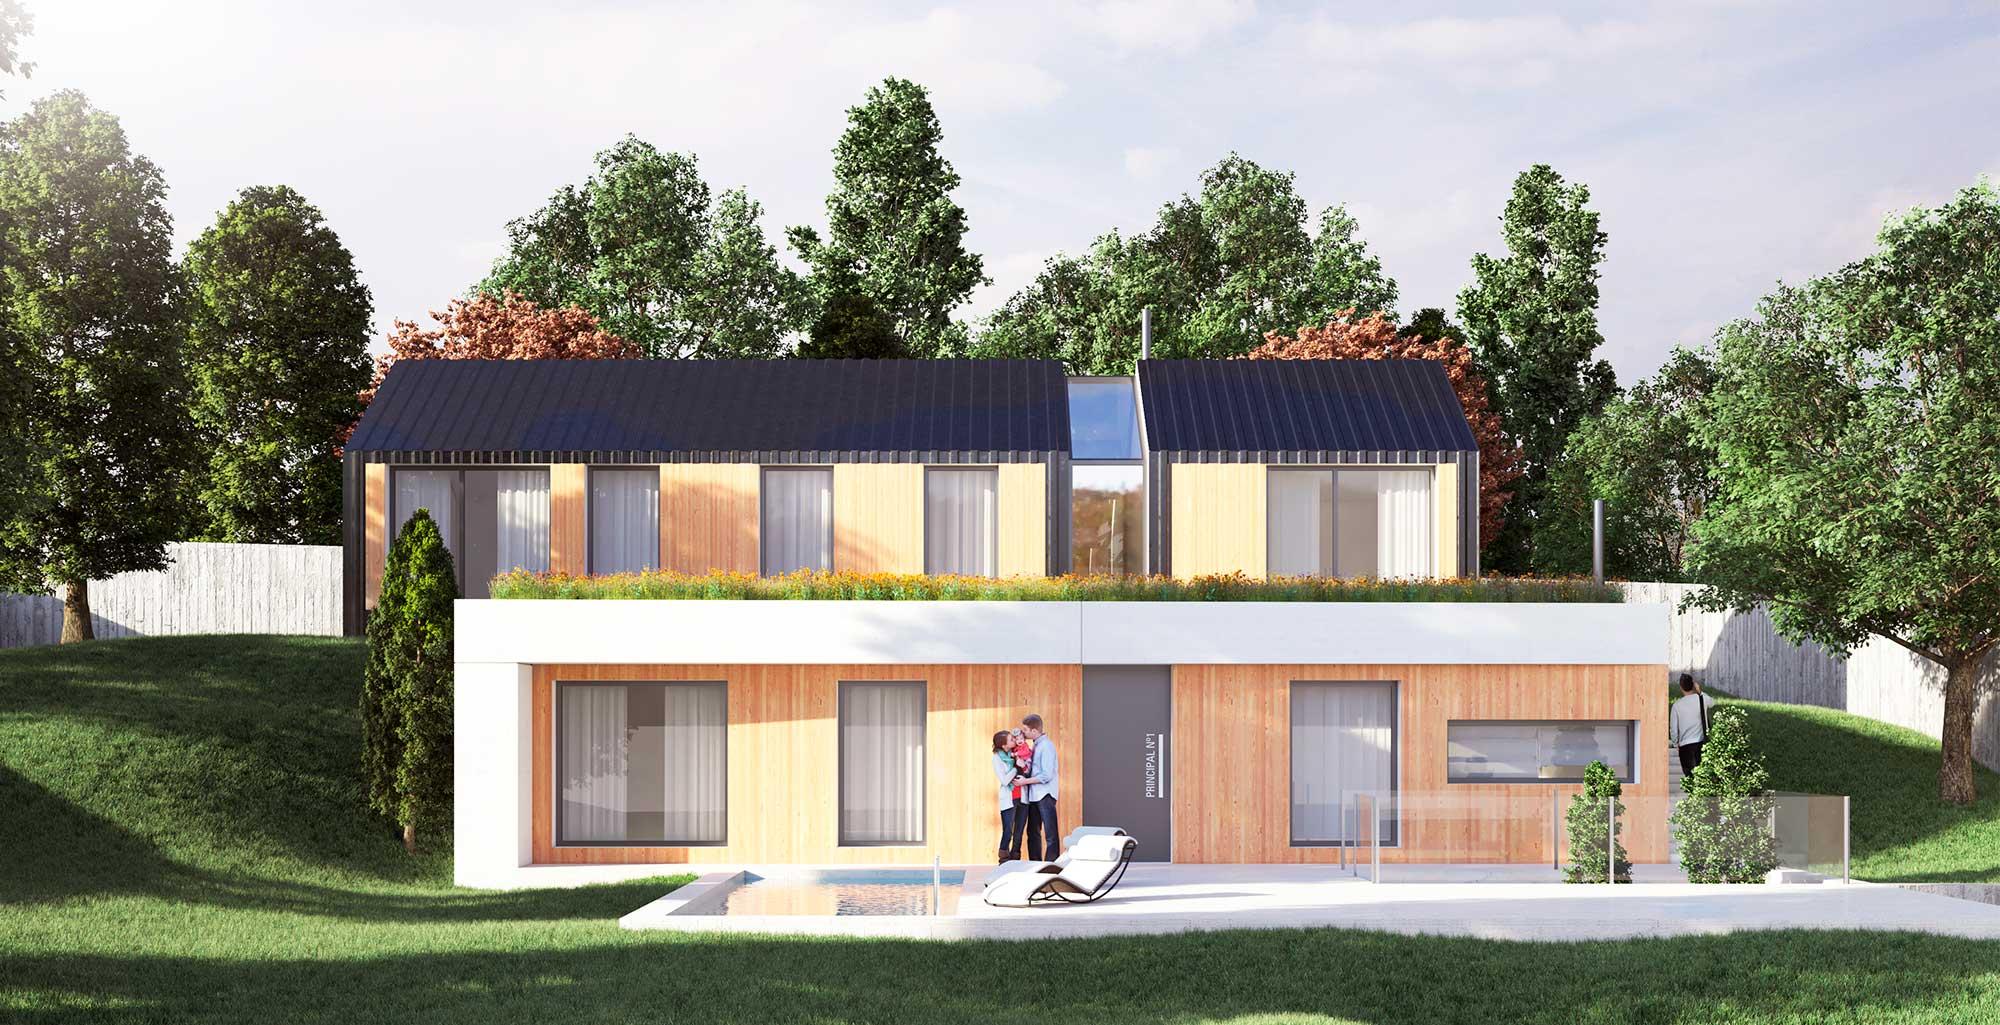 Casa-en-El-Escorial_-Arquitectura-_-EXarchitects_02C